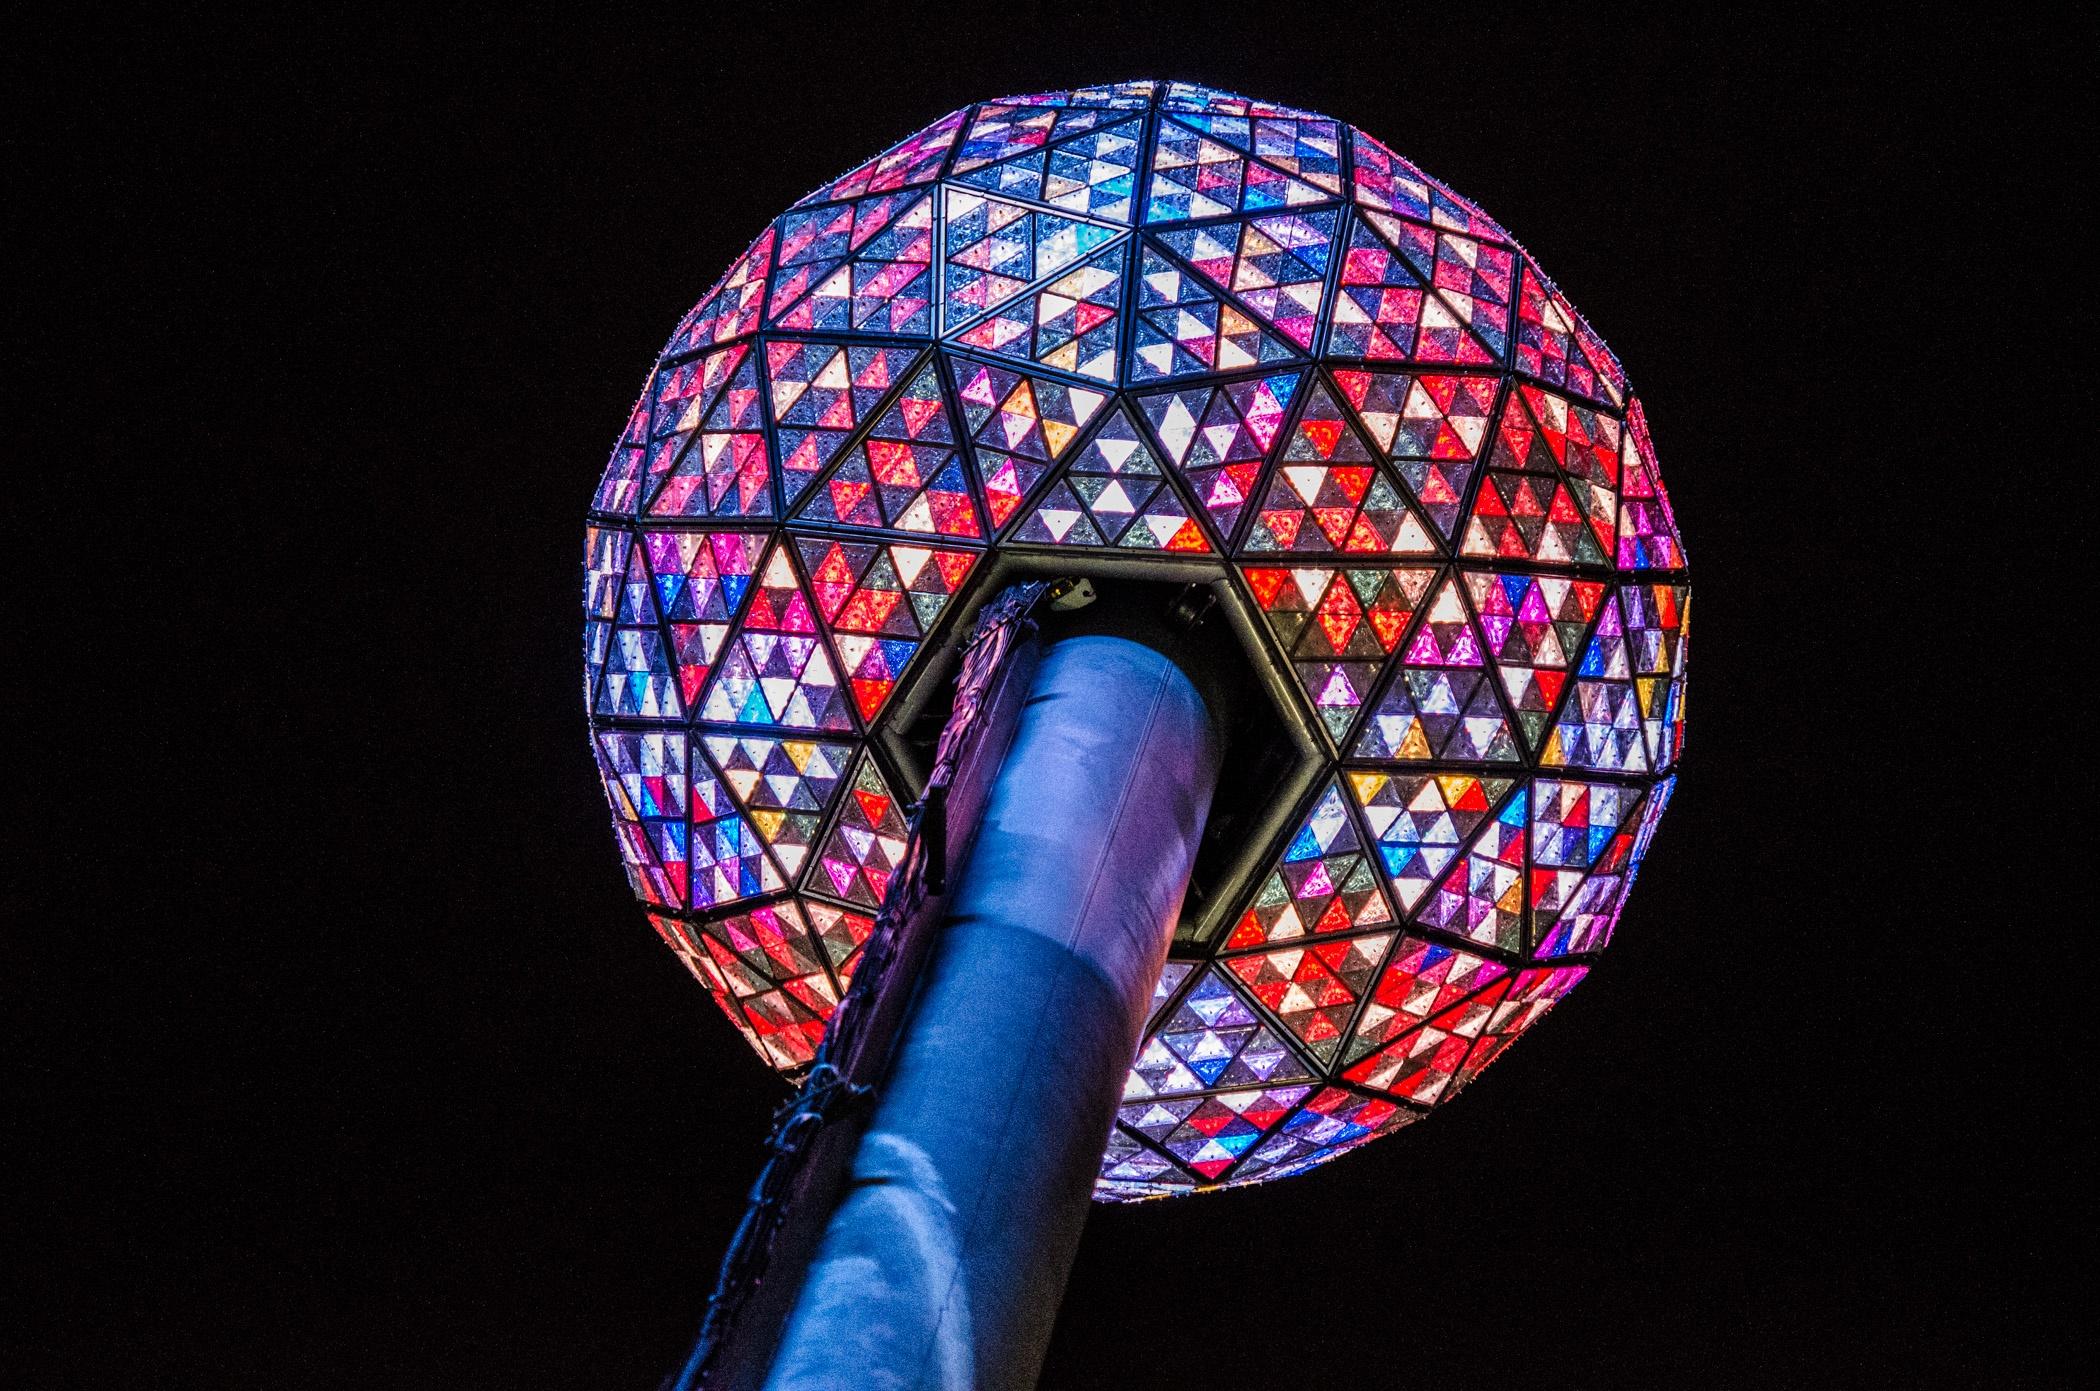 Happy New Year Ball Drop Live Stream